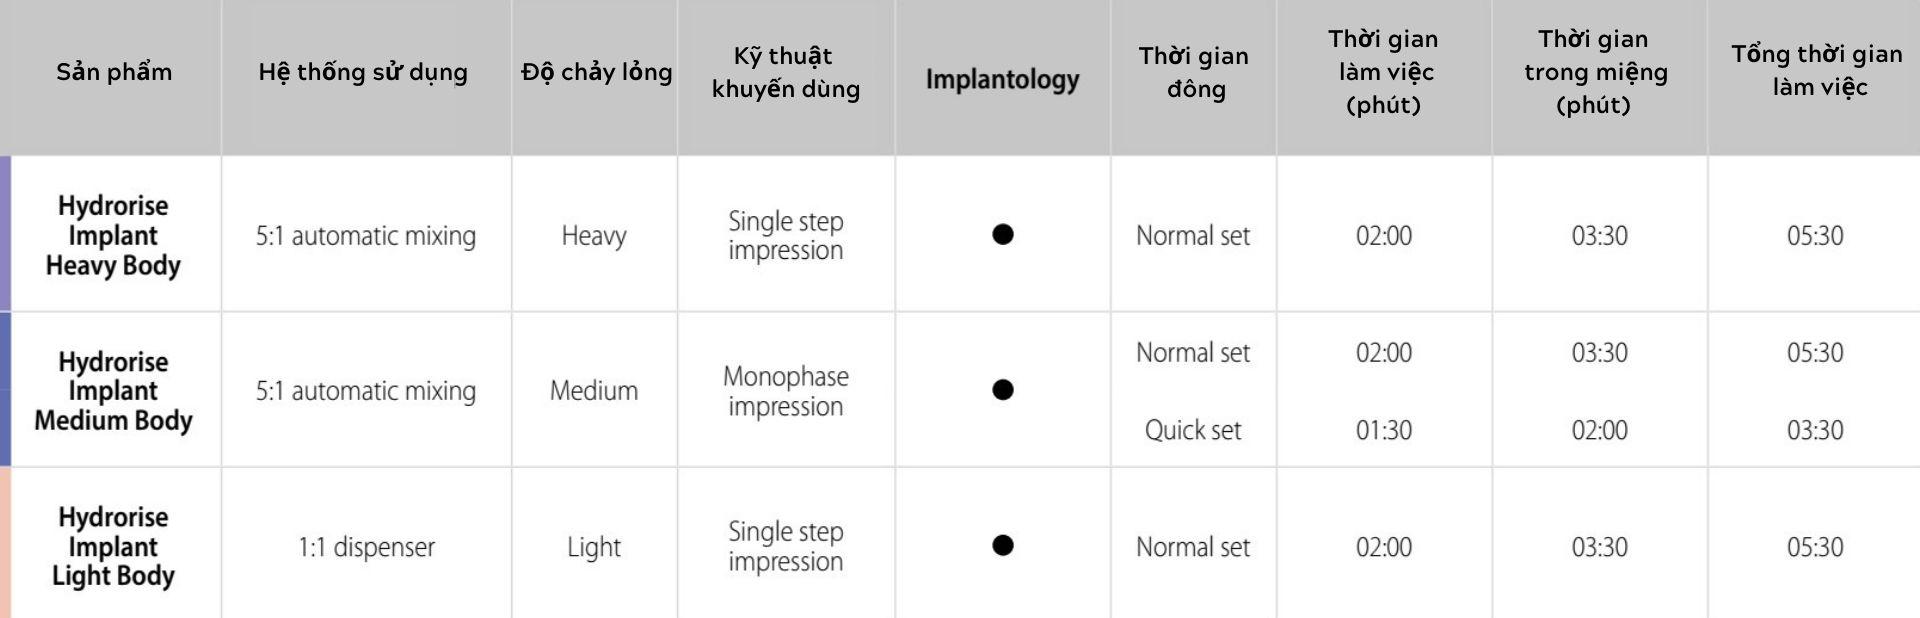 Hydrorise-implant-lay-dau-implant-02